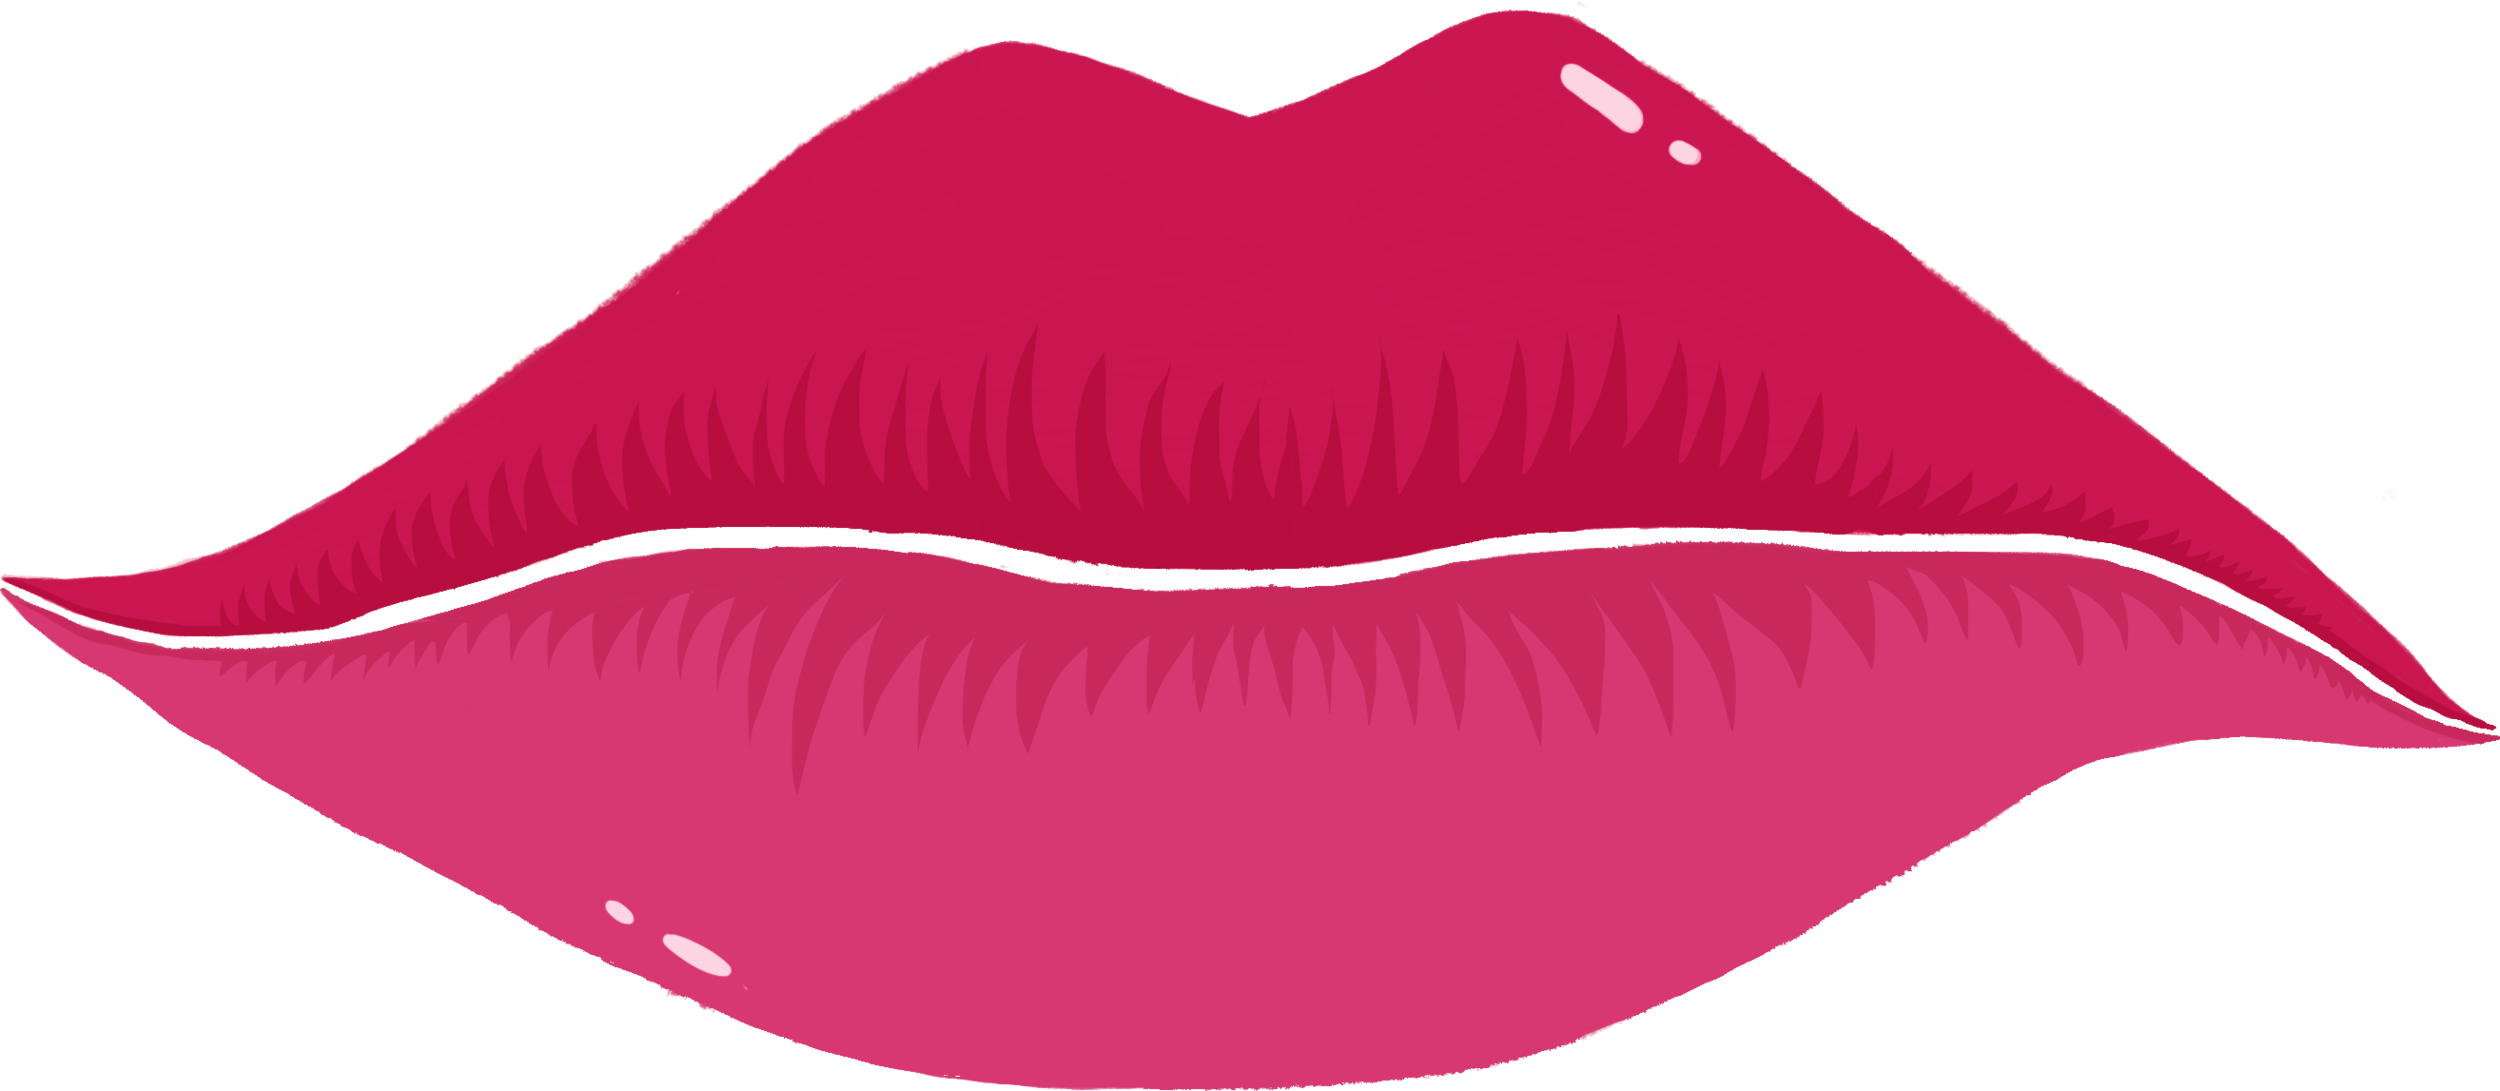 Lips_TransparentBG.png